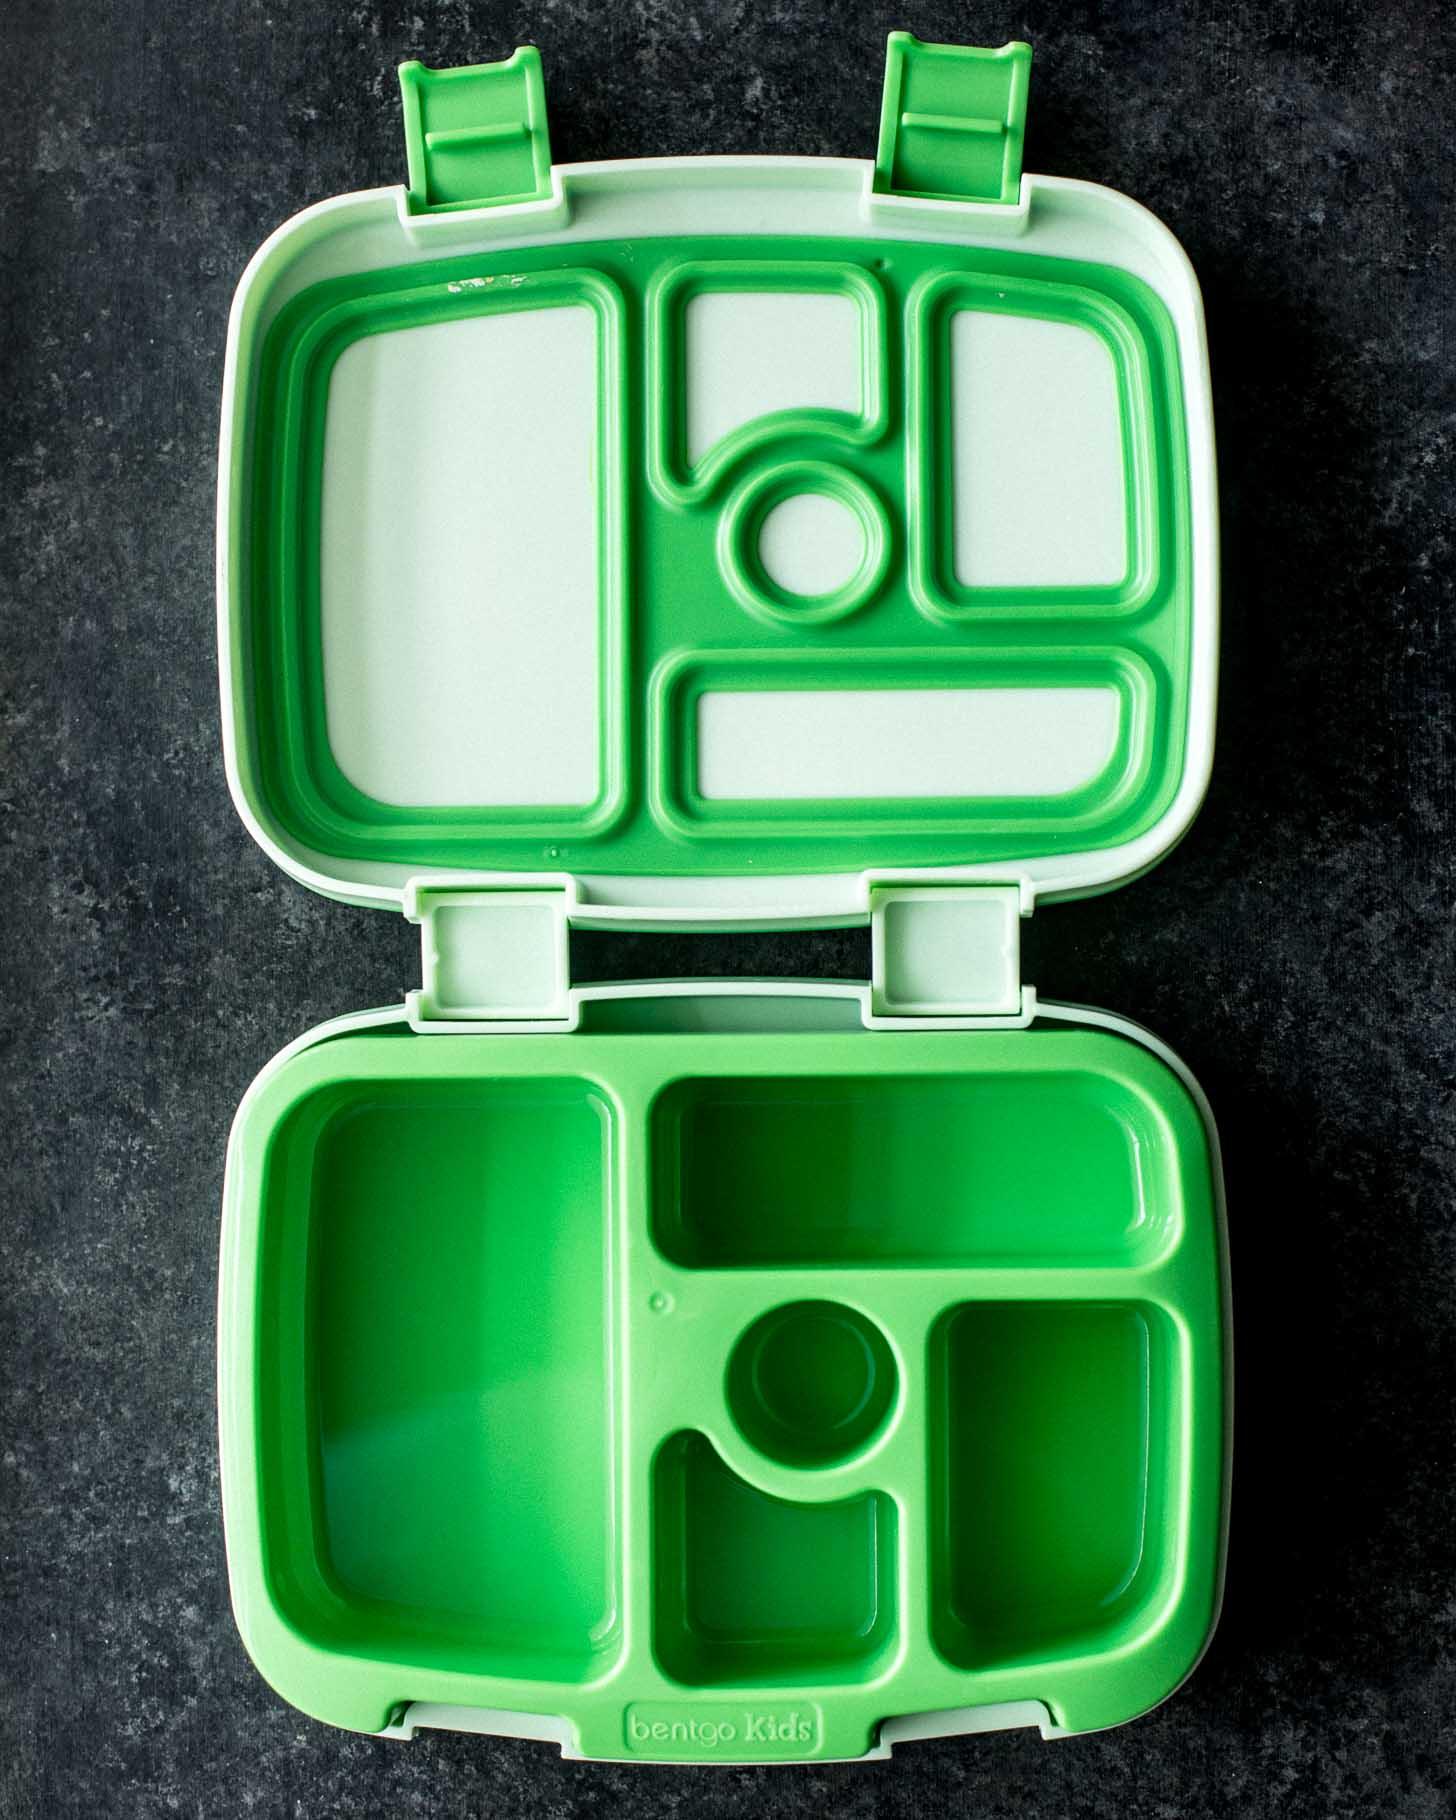 Bentgo Kids Lunch Box - Green